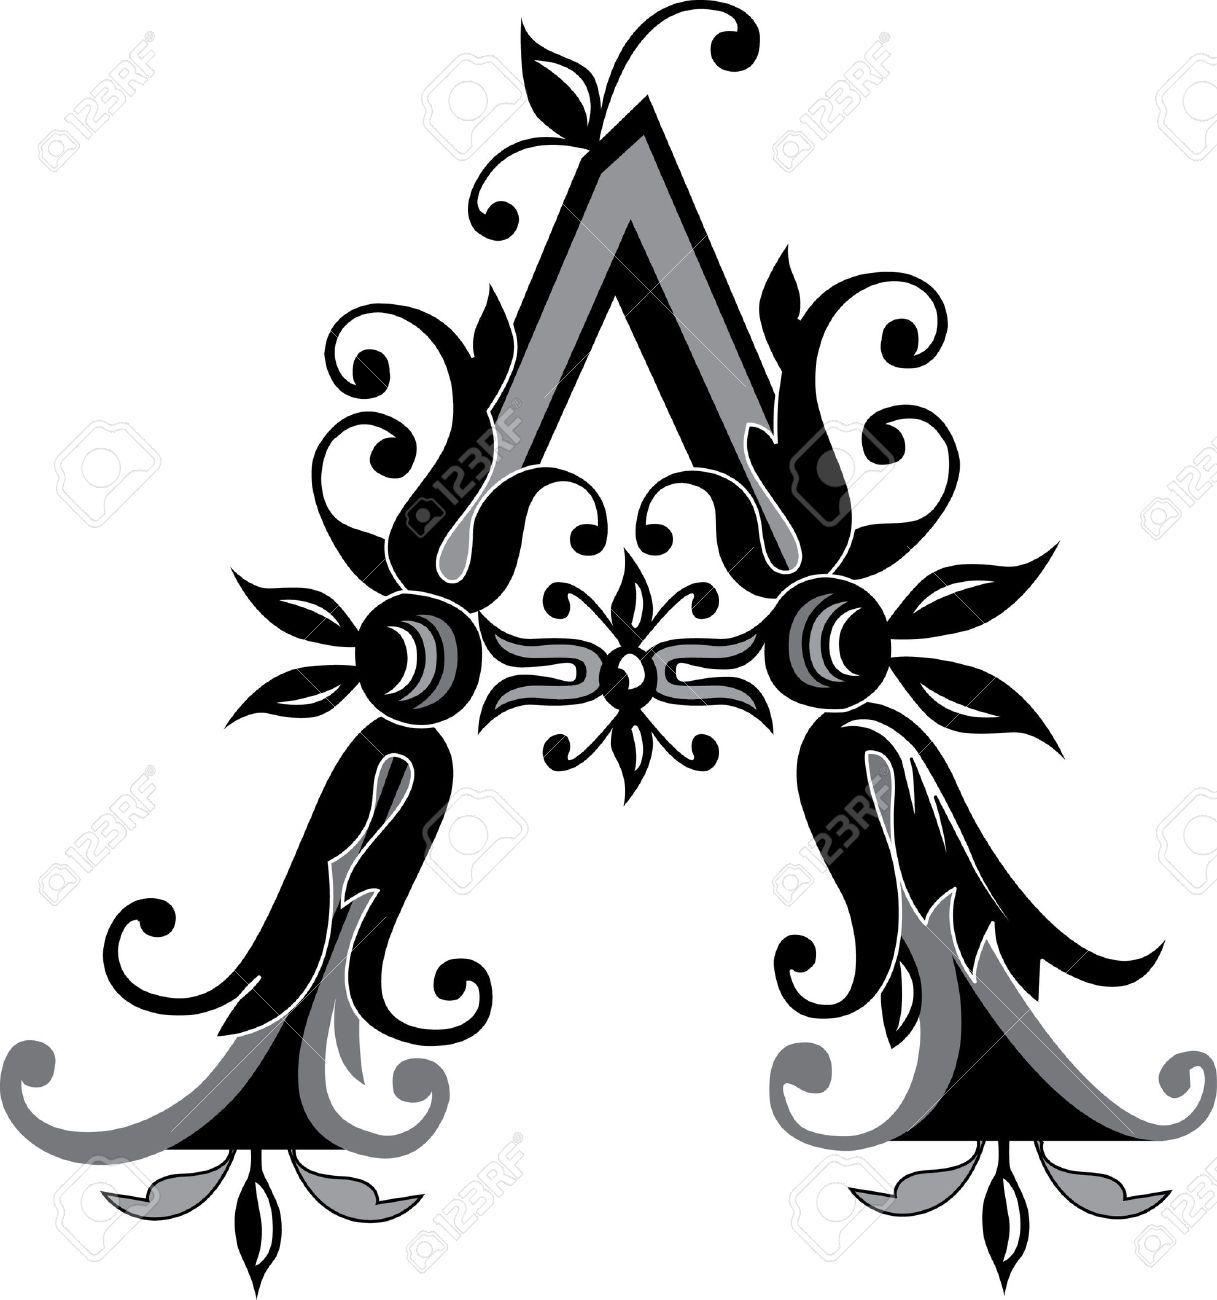 Stock Vector Alphabet letters design, Alphabet, English